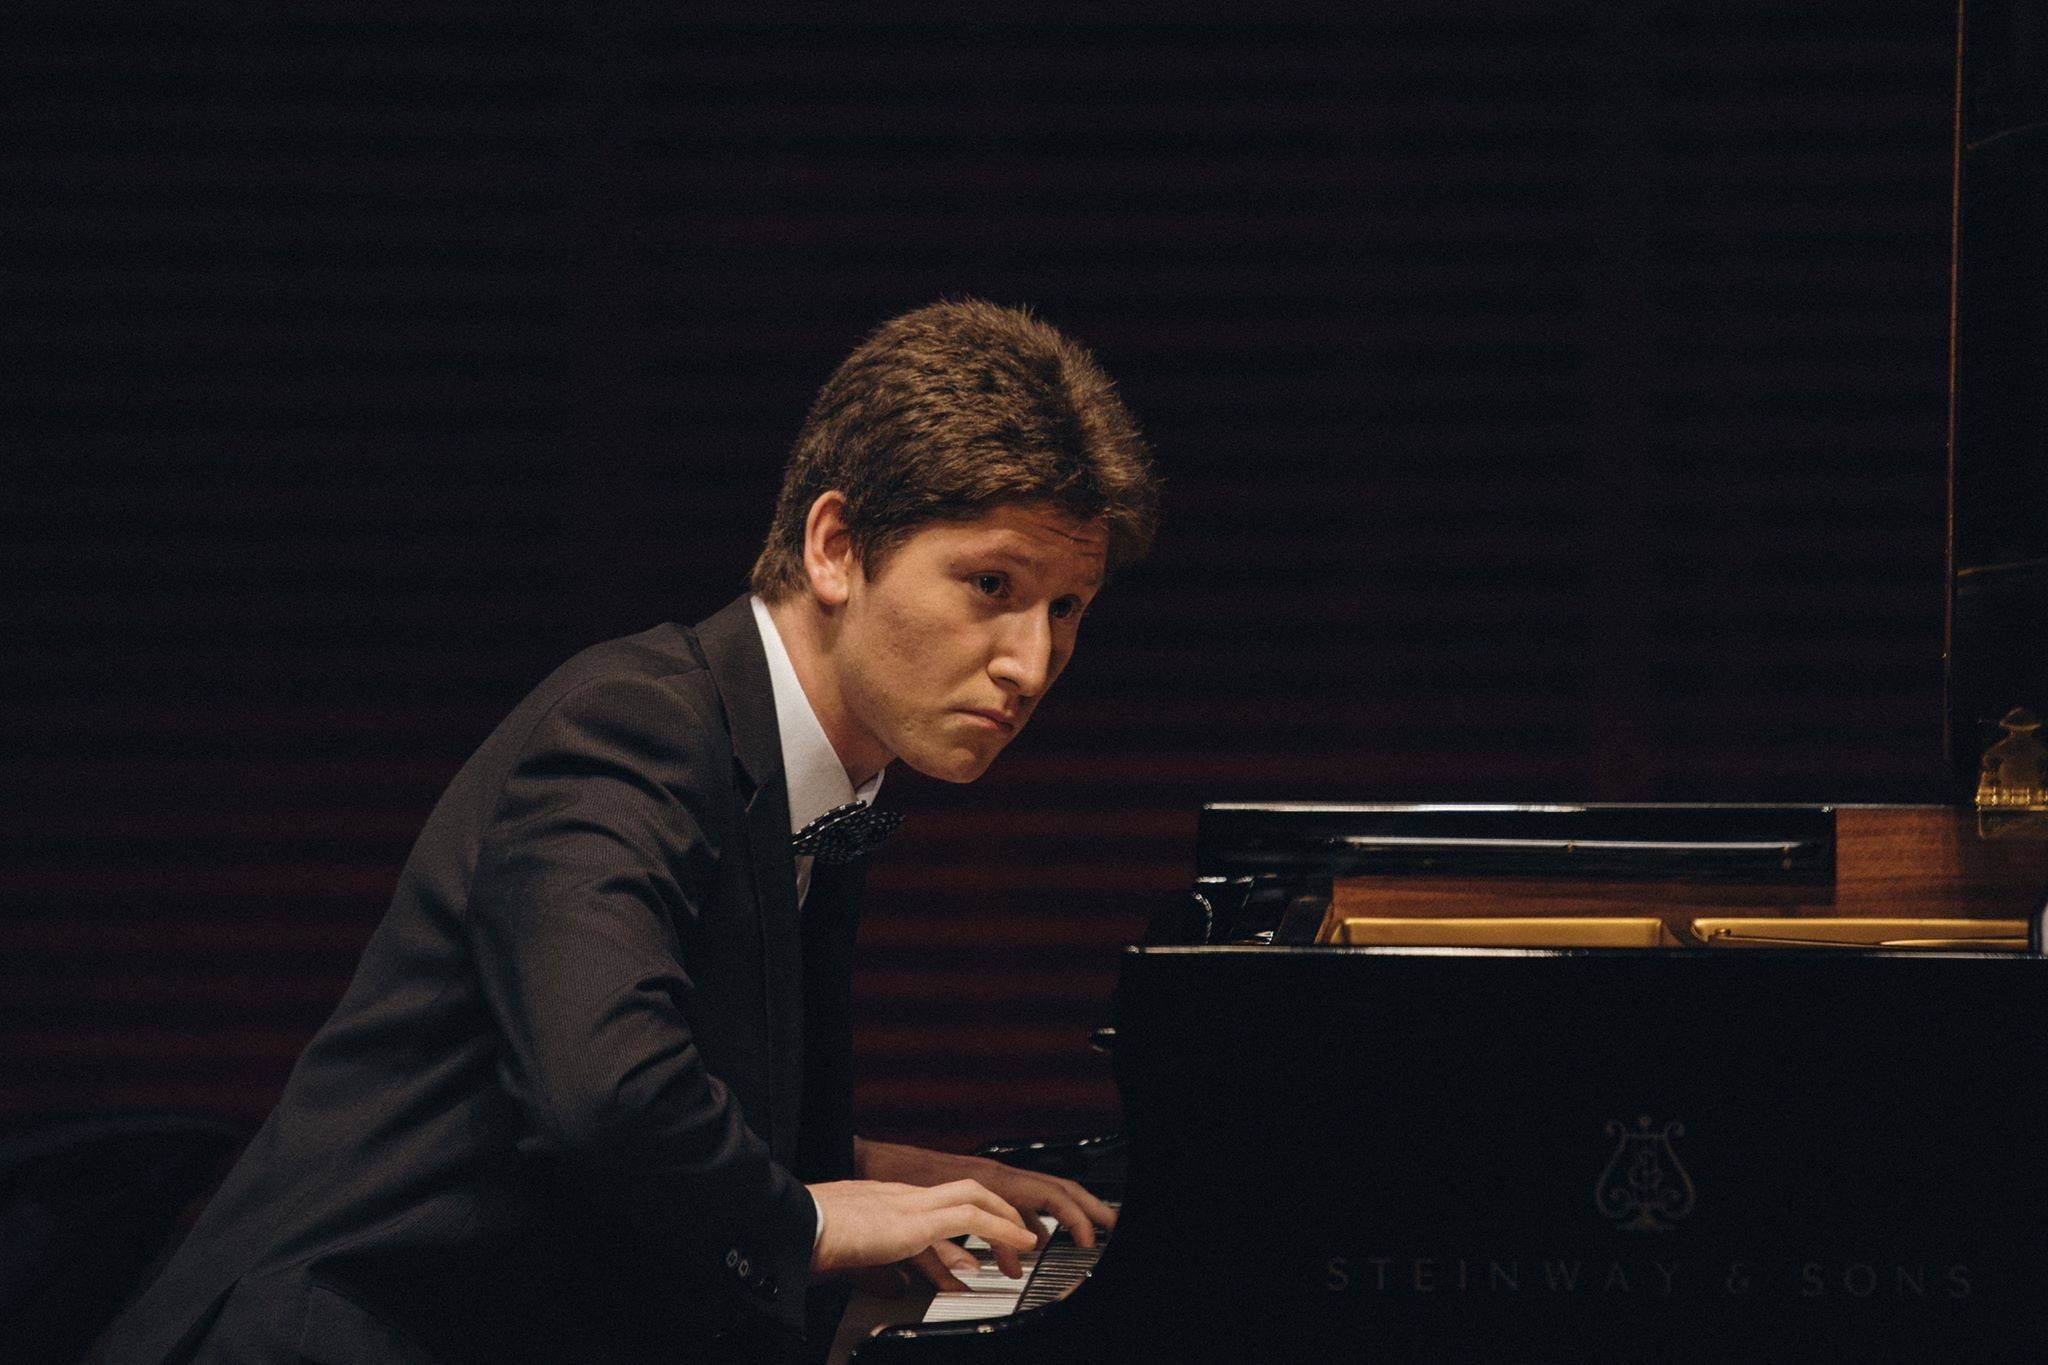 British piano student makes La Scala recital debut